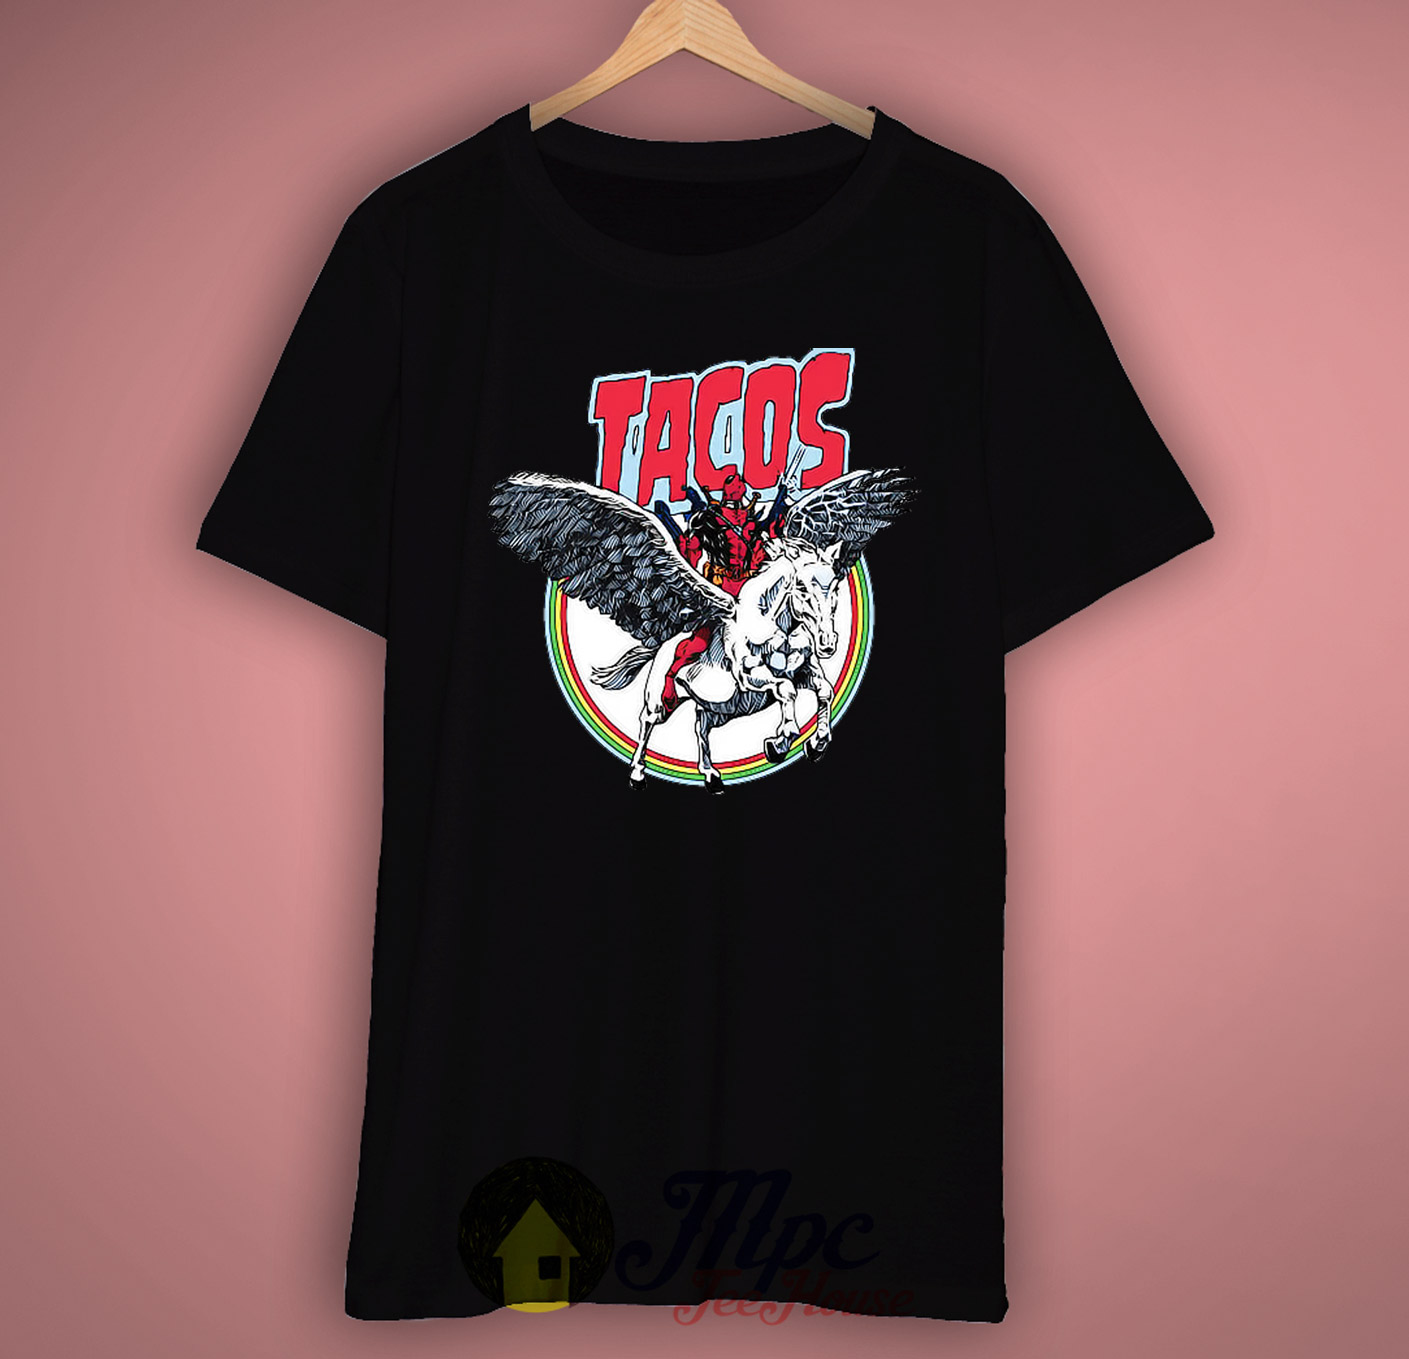 Funny Deadpool Tacopool Unisex Premium T Shirt Size S M L Xl 2xl